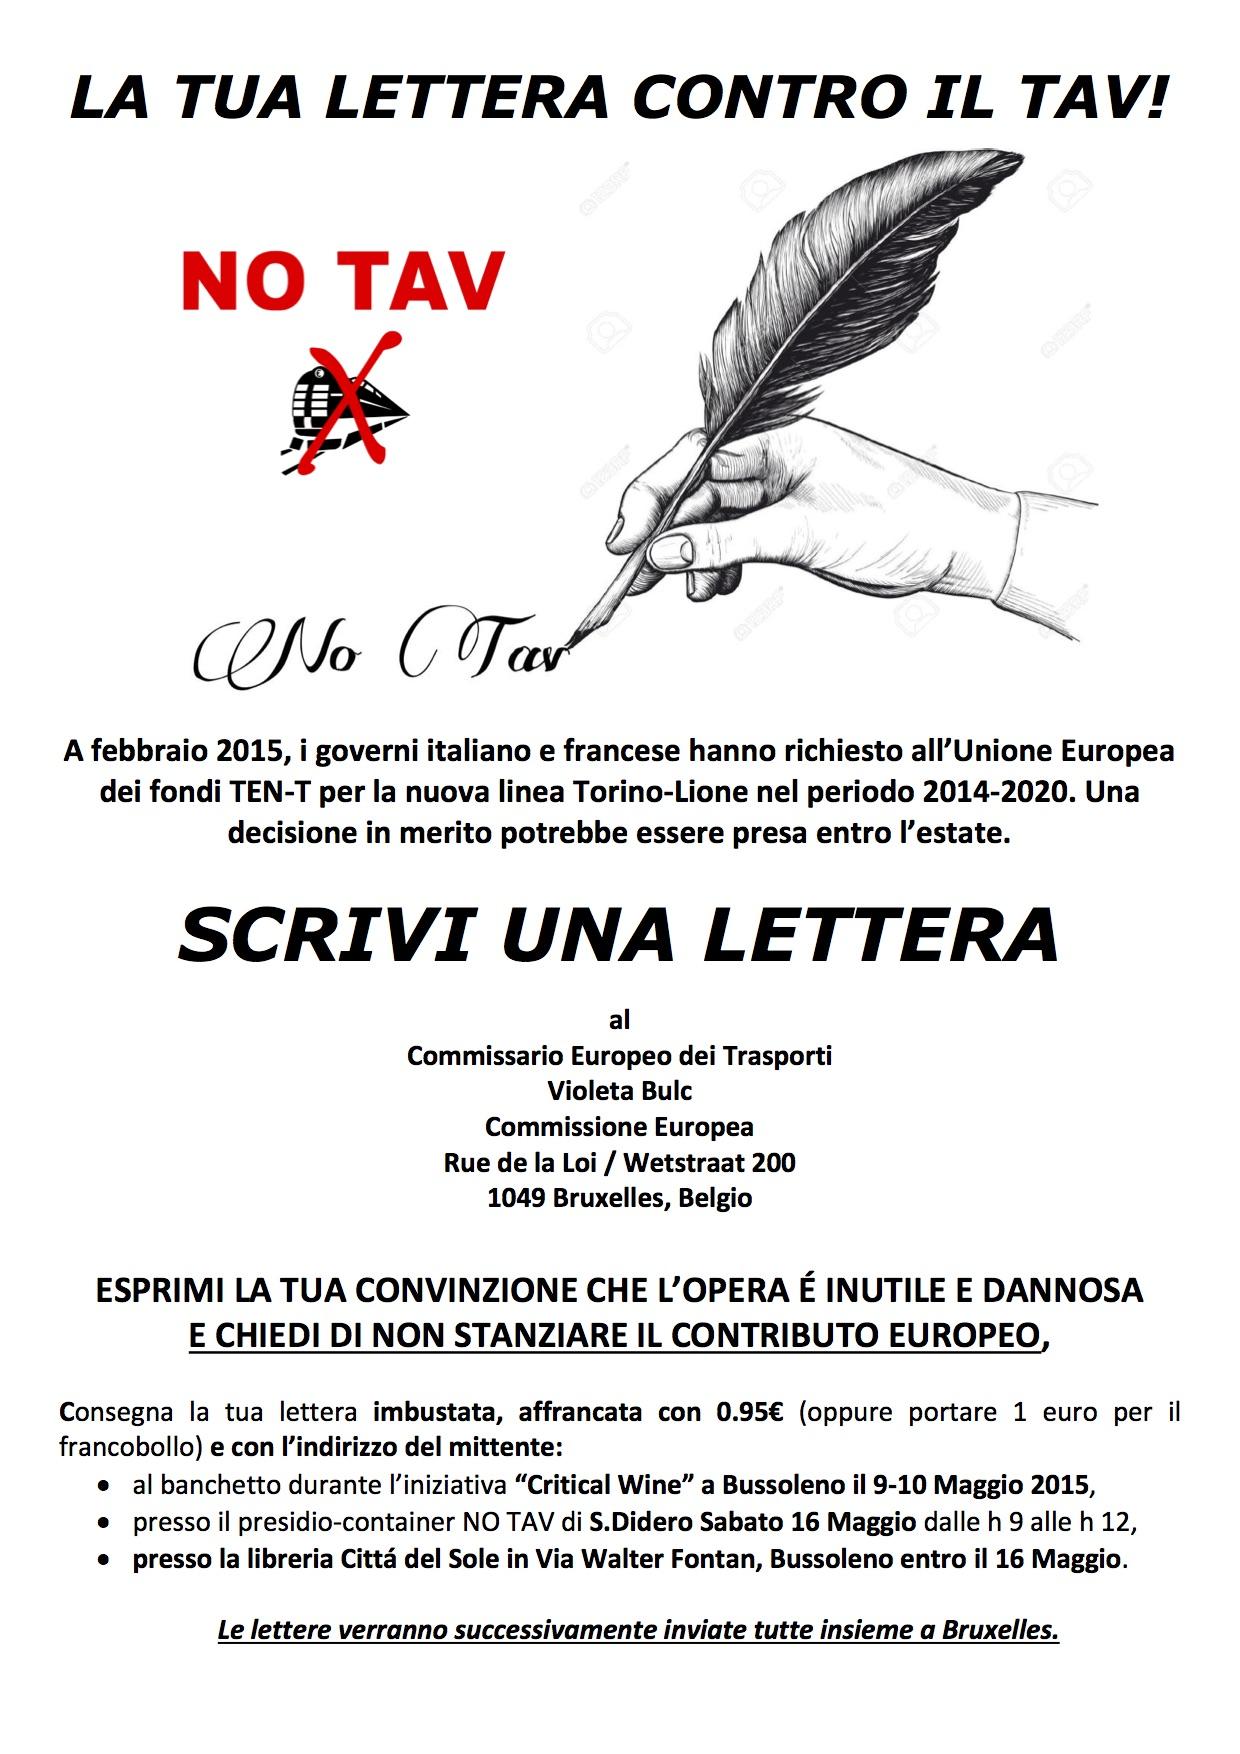 manifesto lettere